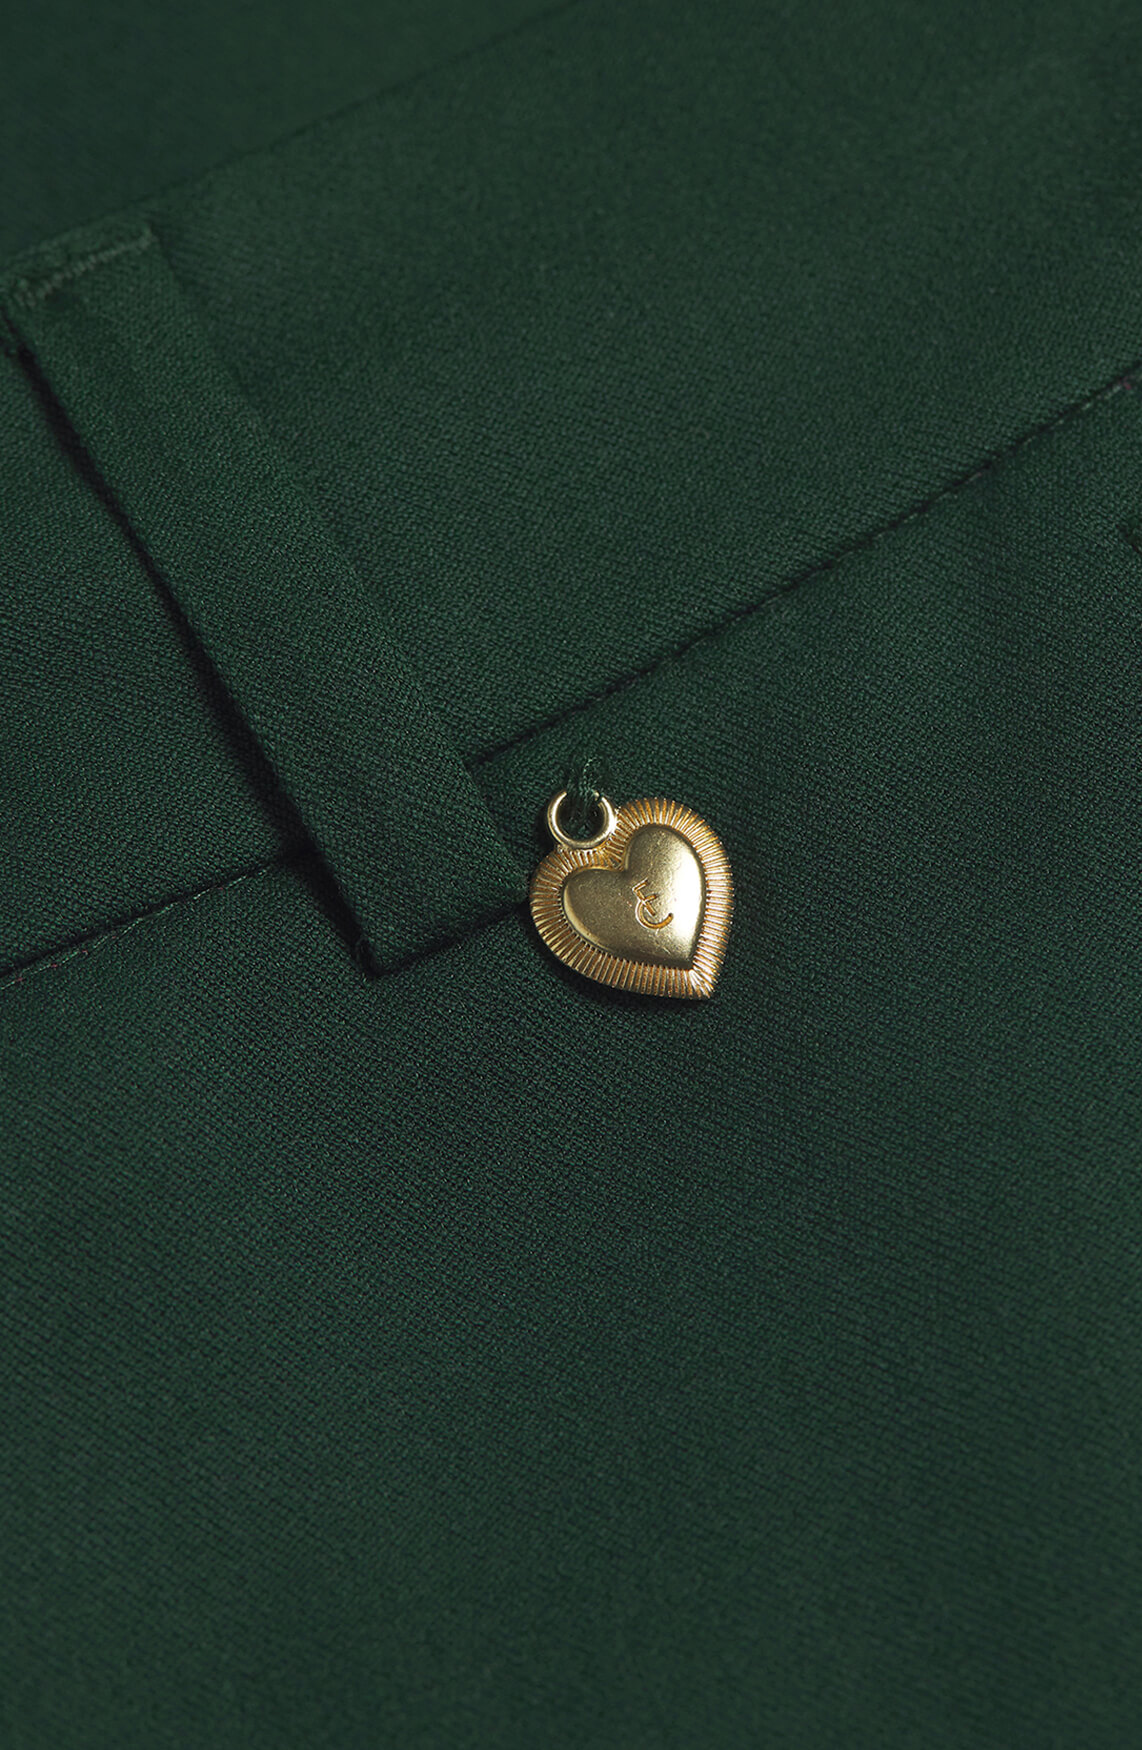 Fabienne Chapot Dames Hugo pantalon groen